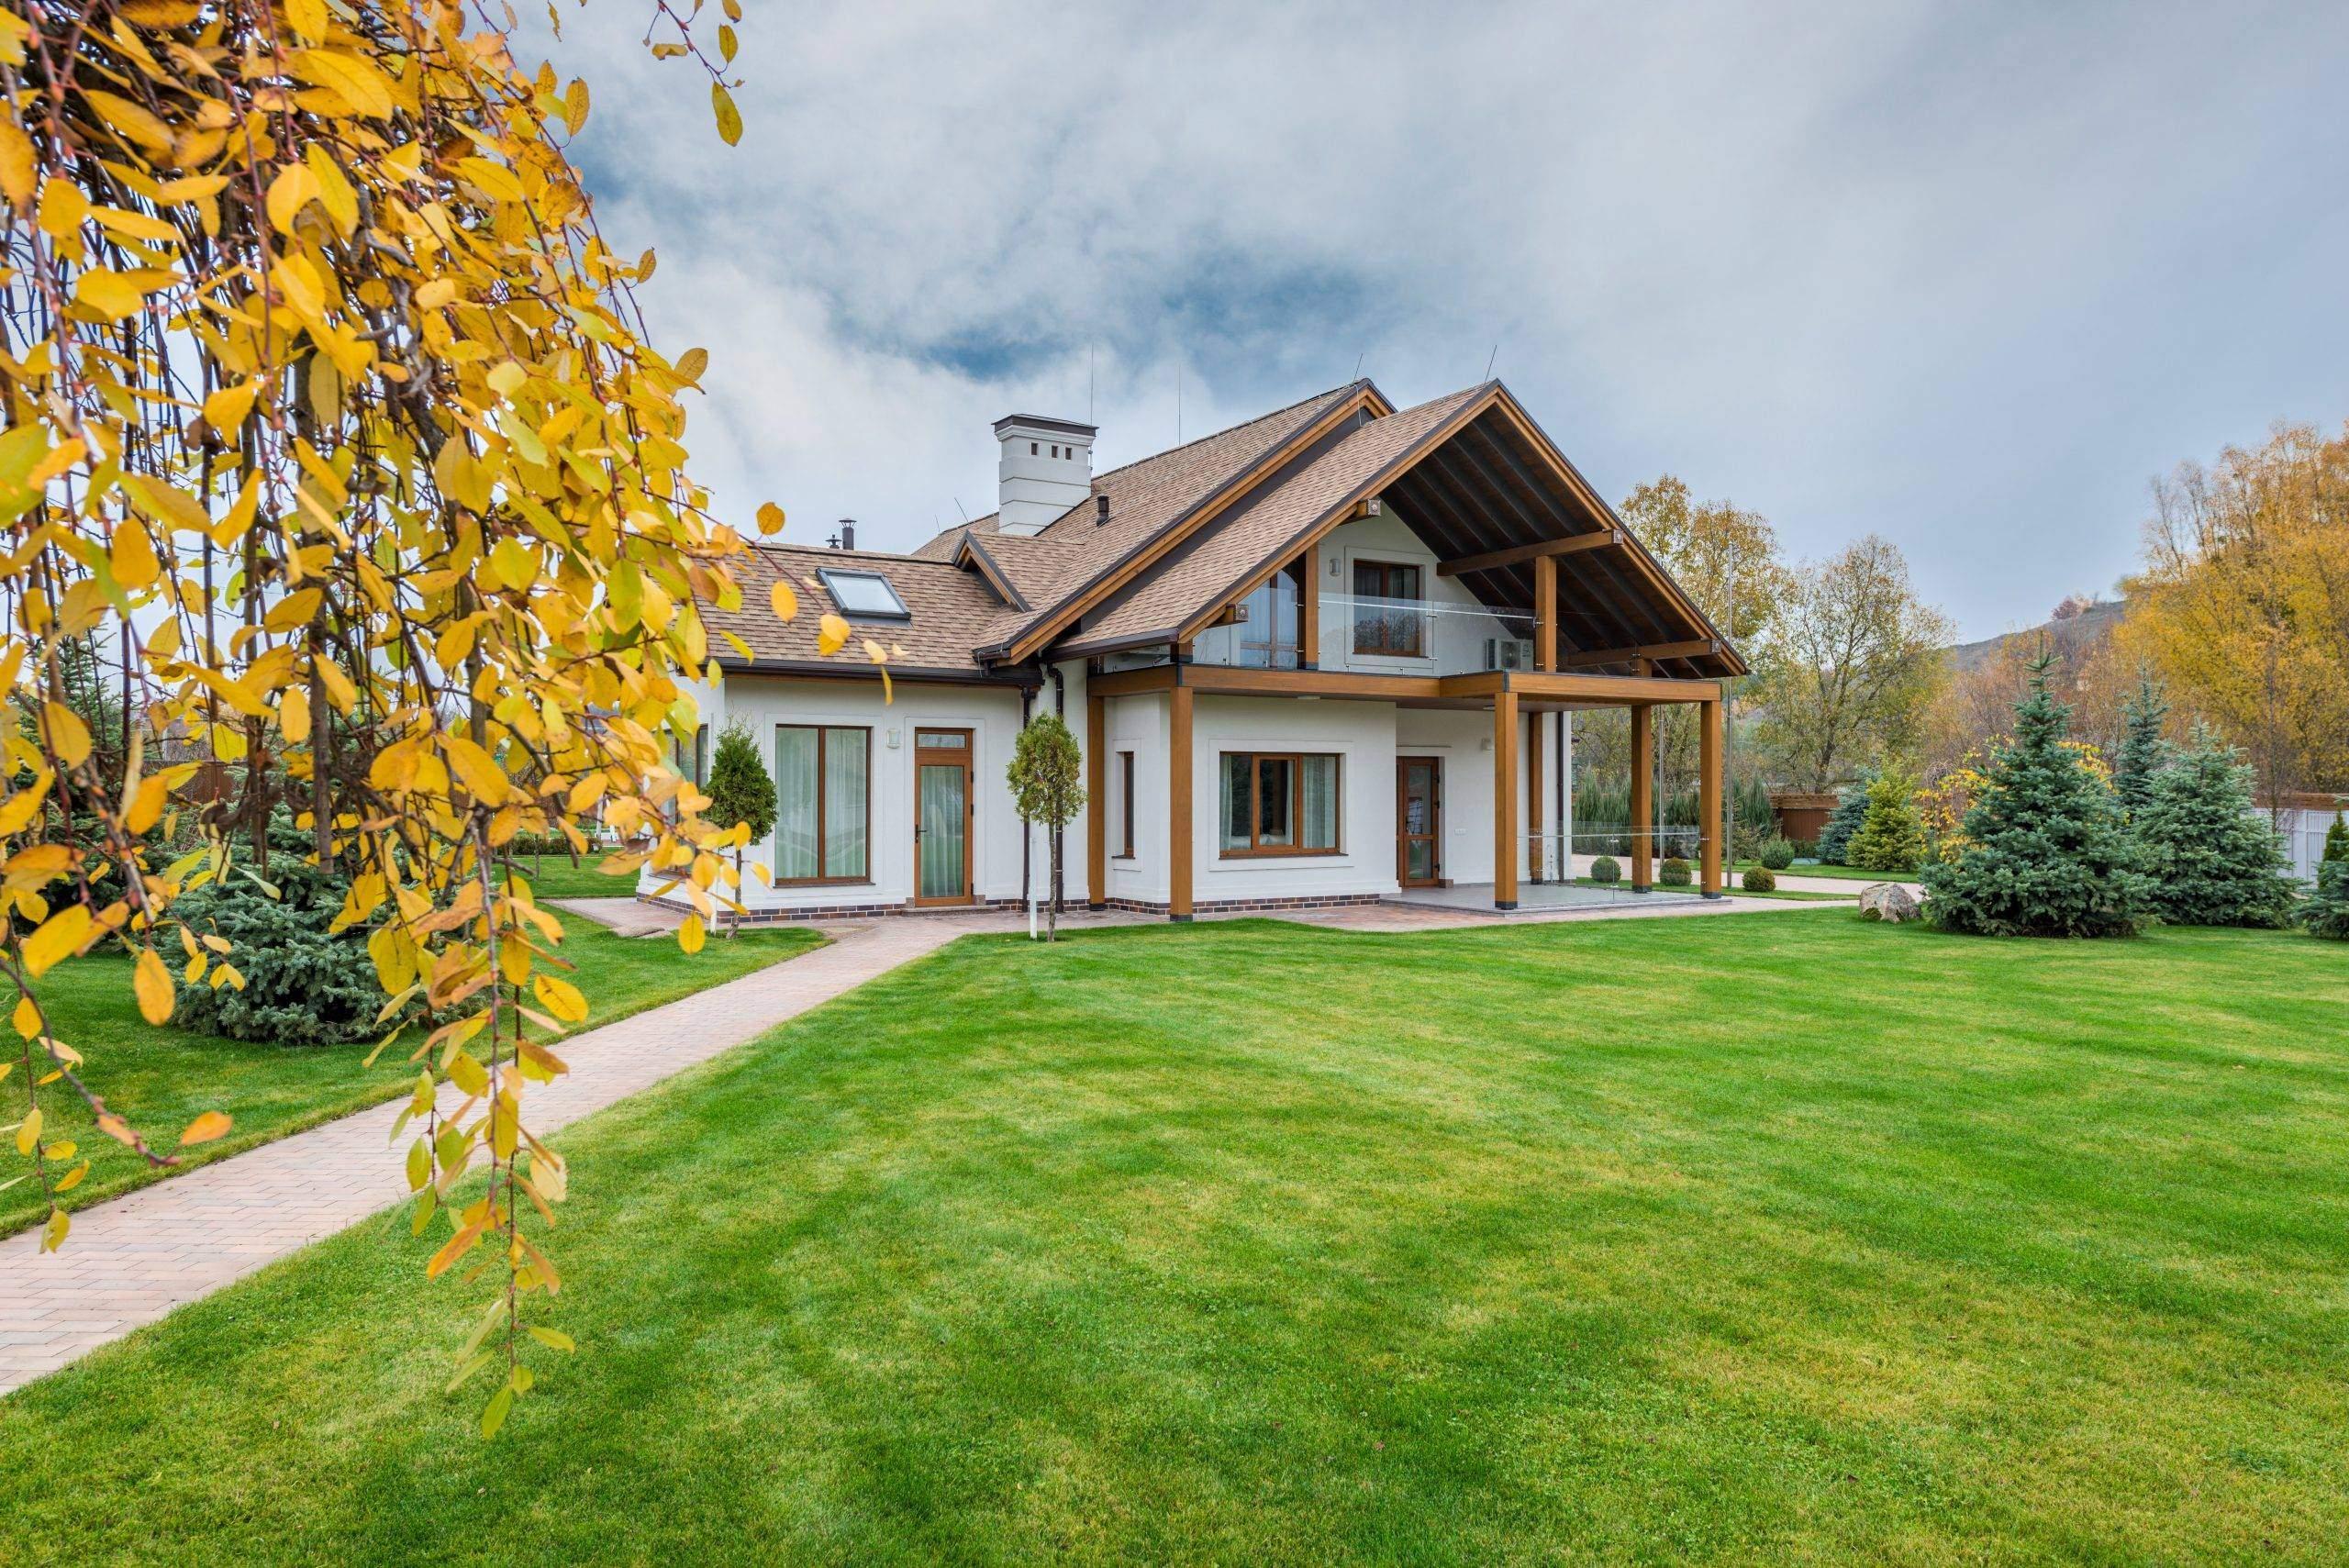 Backyard Patio Design Ideas: Simple Tips To Improve Your Yard